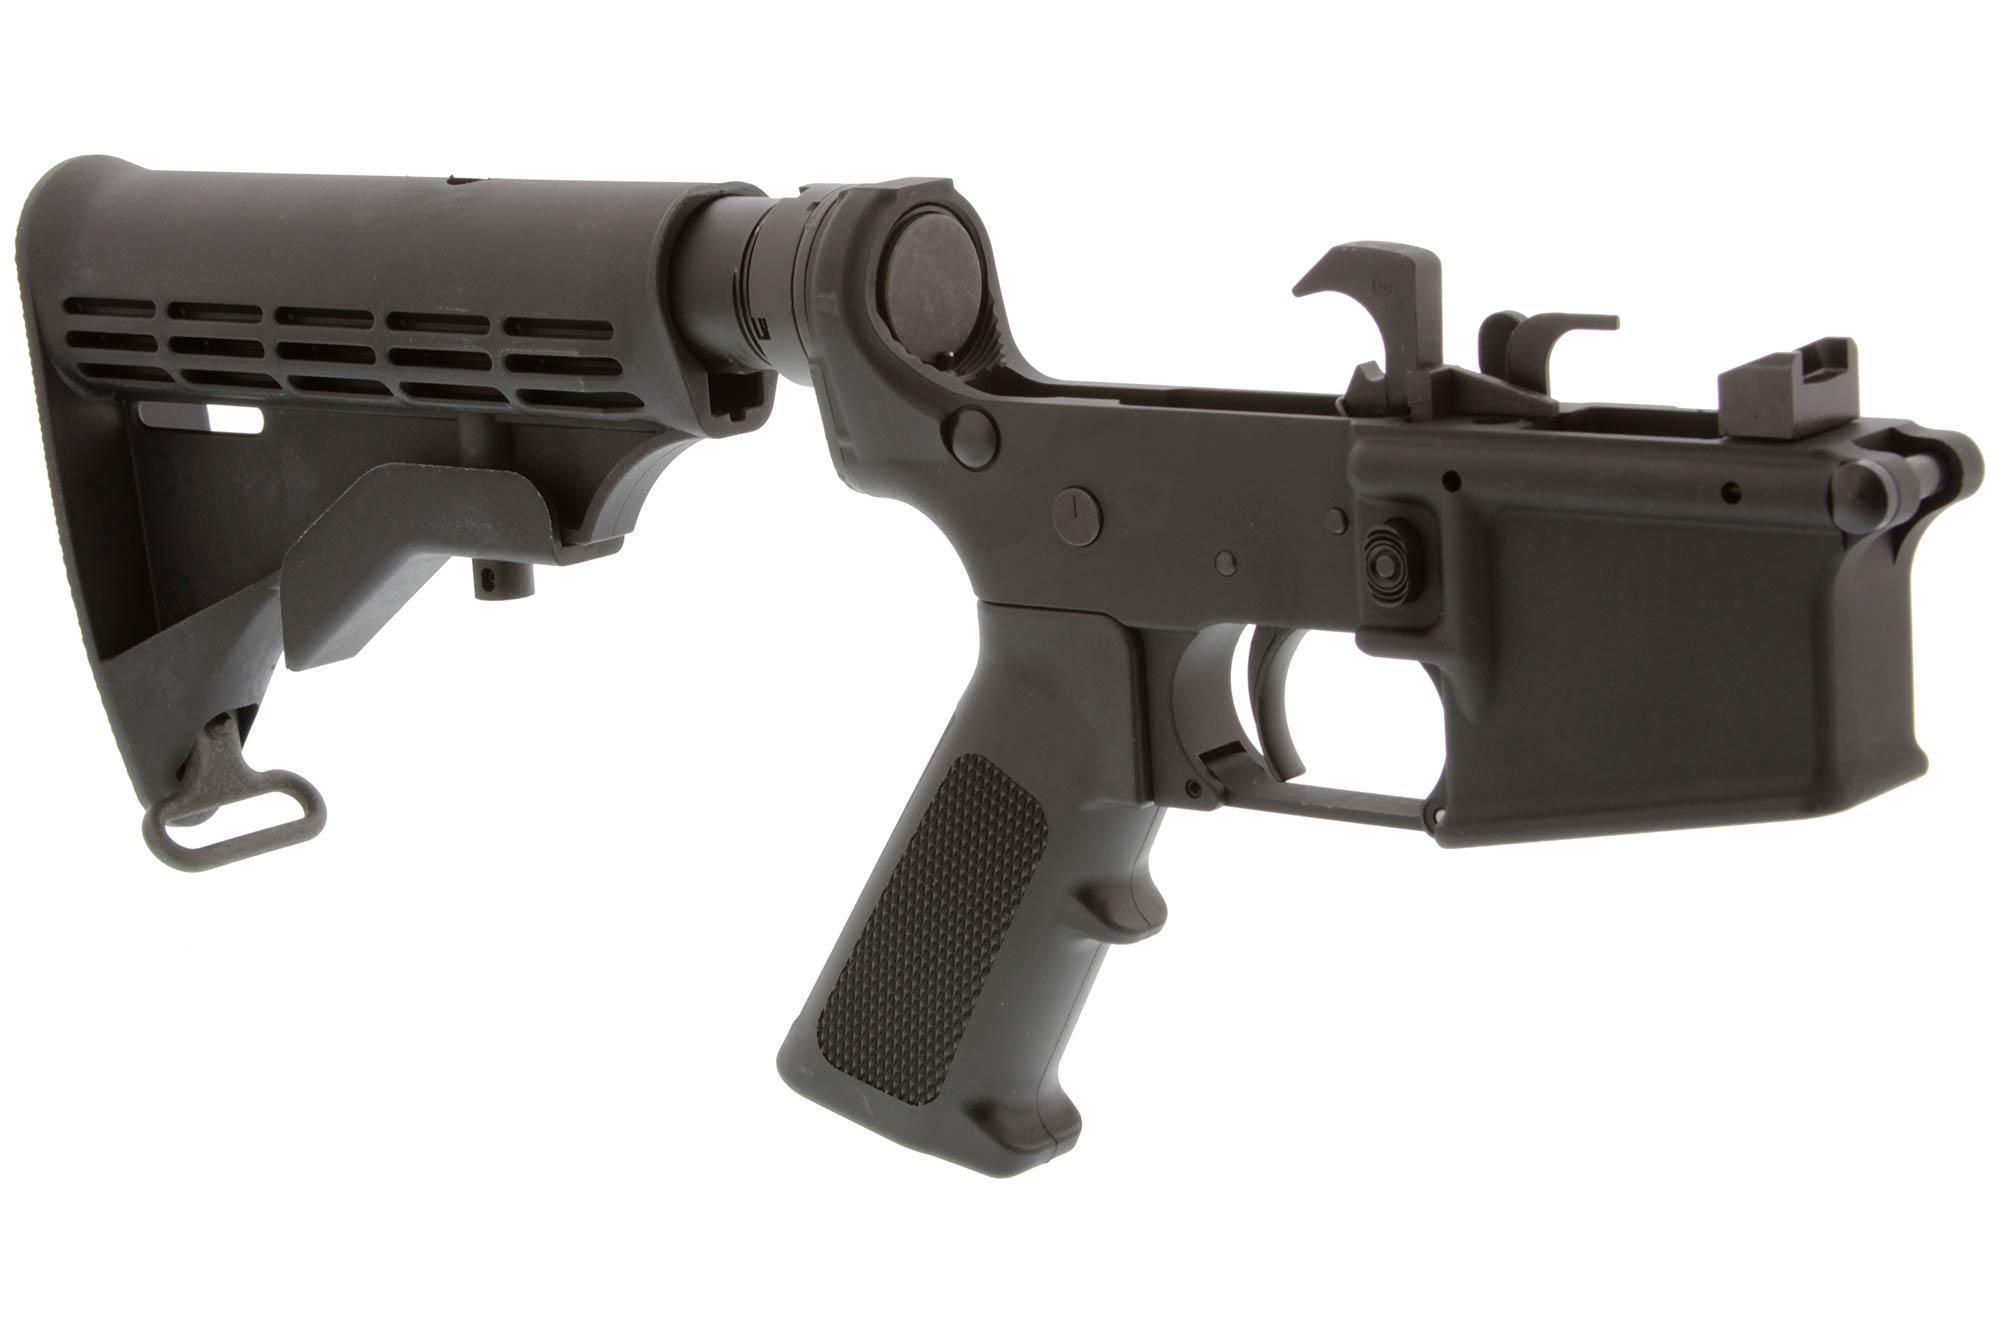 M4 stock options